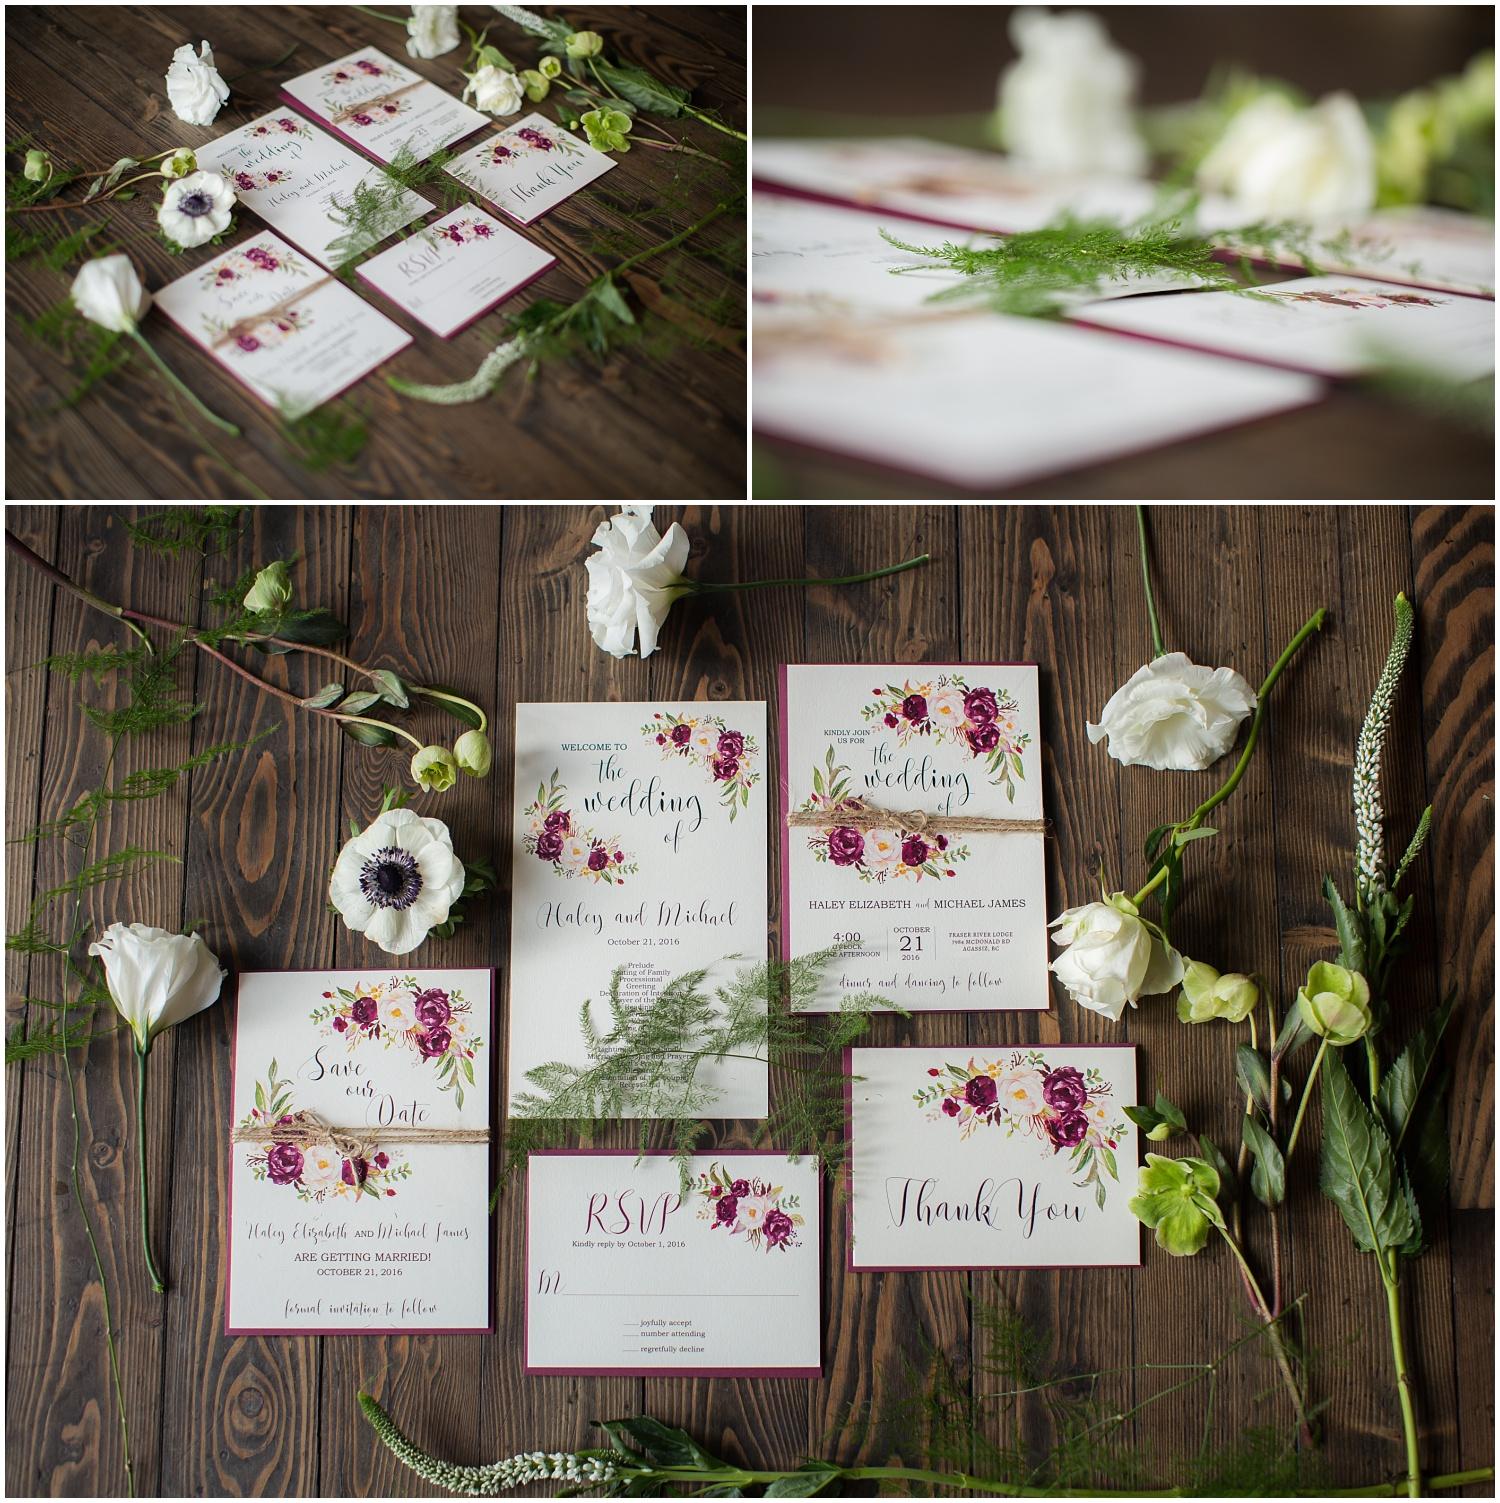 Amazing Day Photography - Fraser River Lodge Styled Session - Woodland Wedding - Green Tones - Green and White Wedding - Blush Wedding Dress - Morilee Wedding Dress - BC Wedding (2).jpg